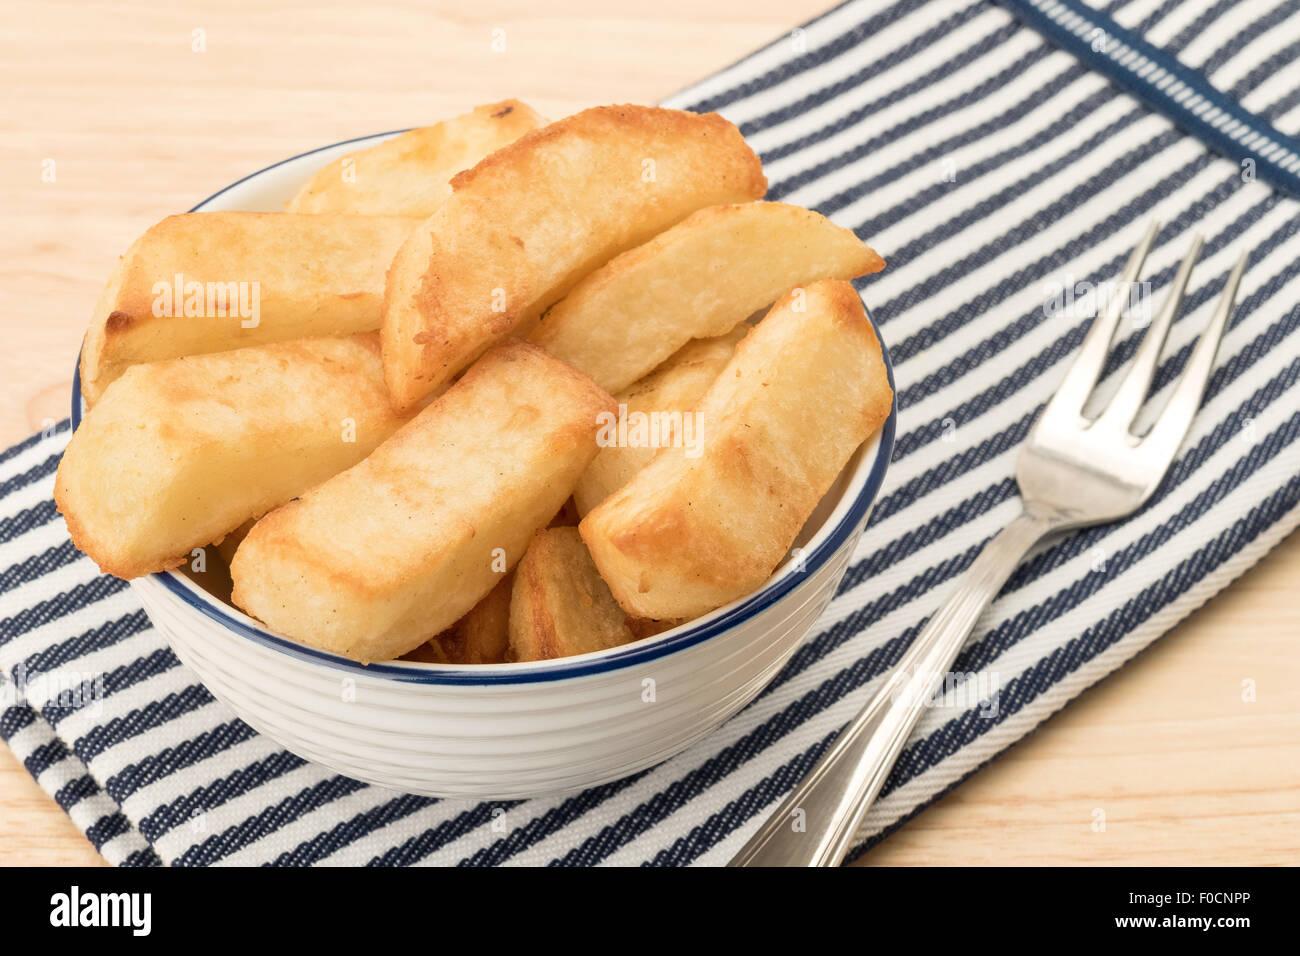 Bowl of French fries - studio shot - Stock Image